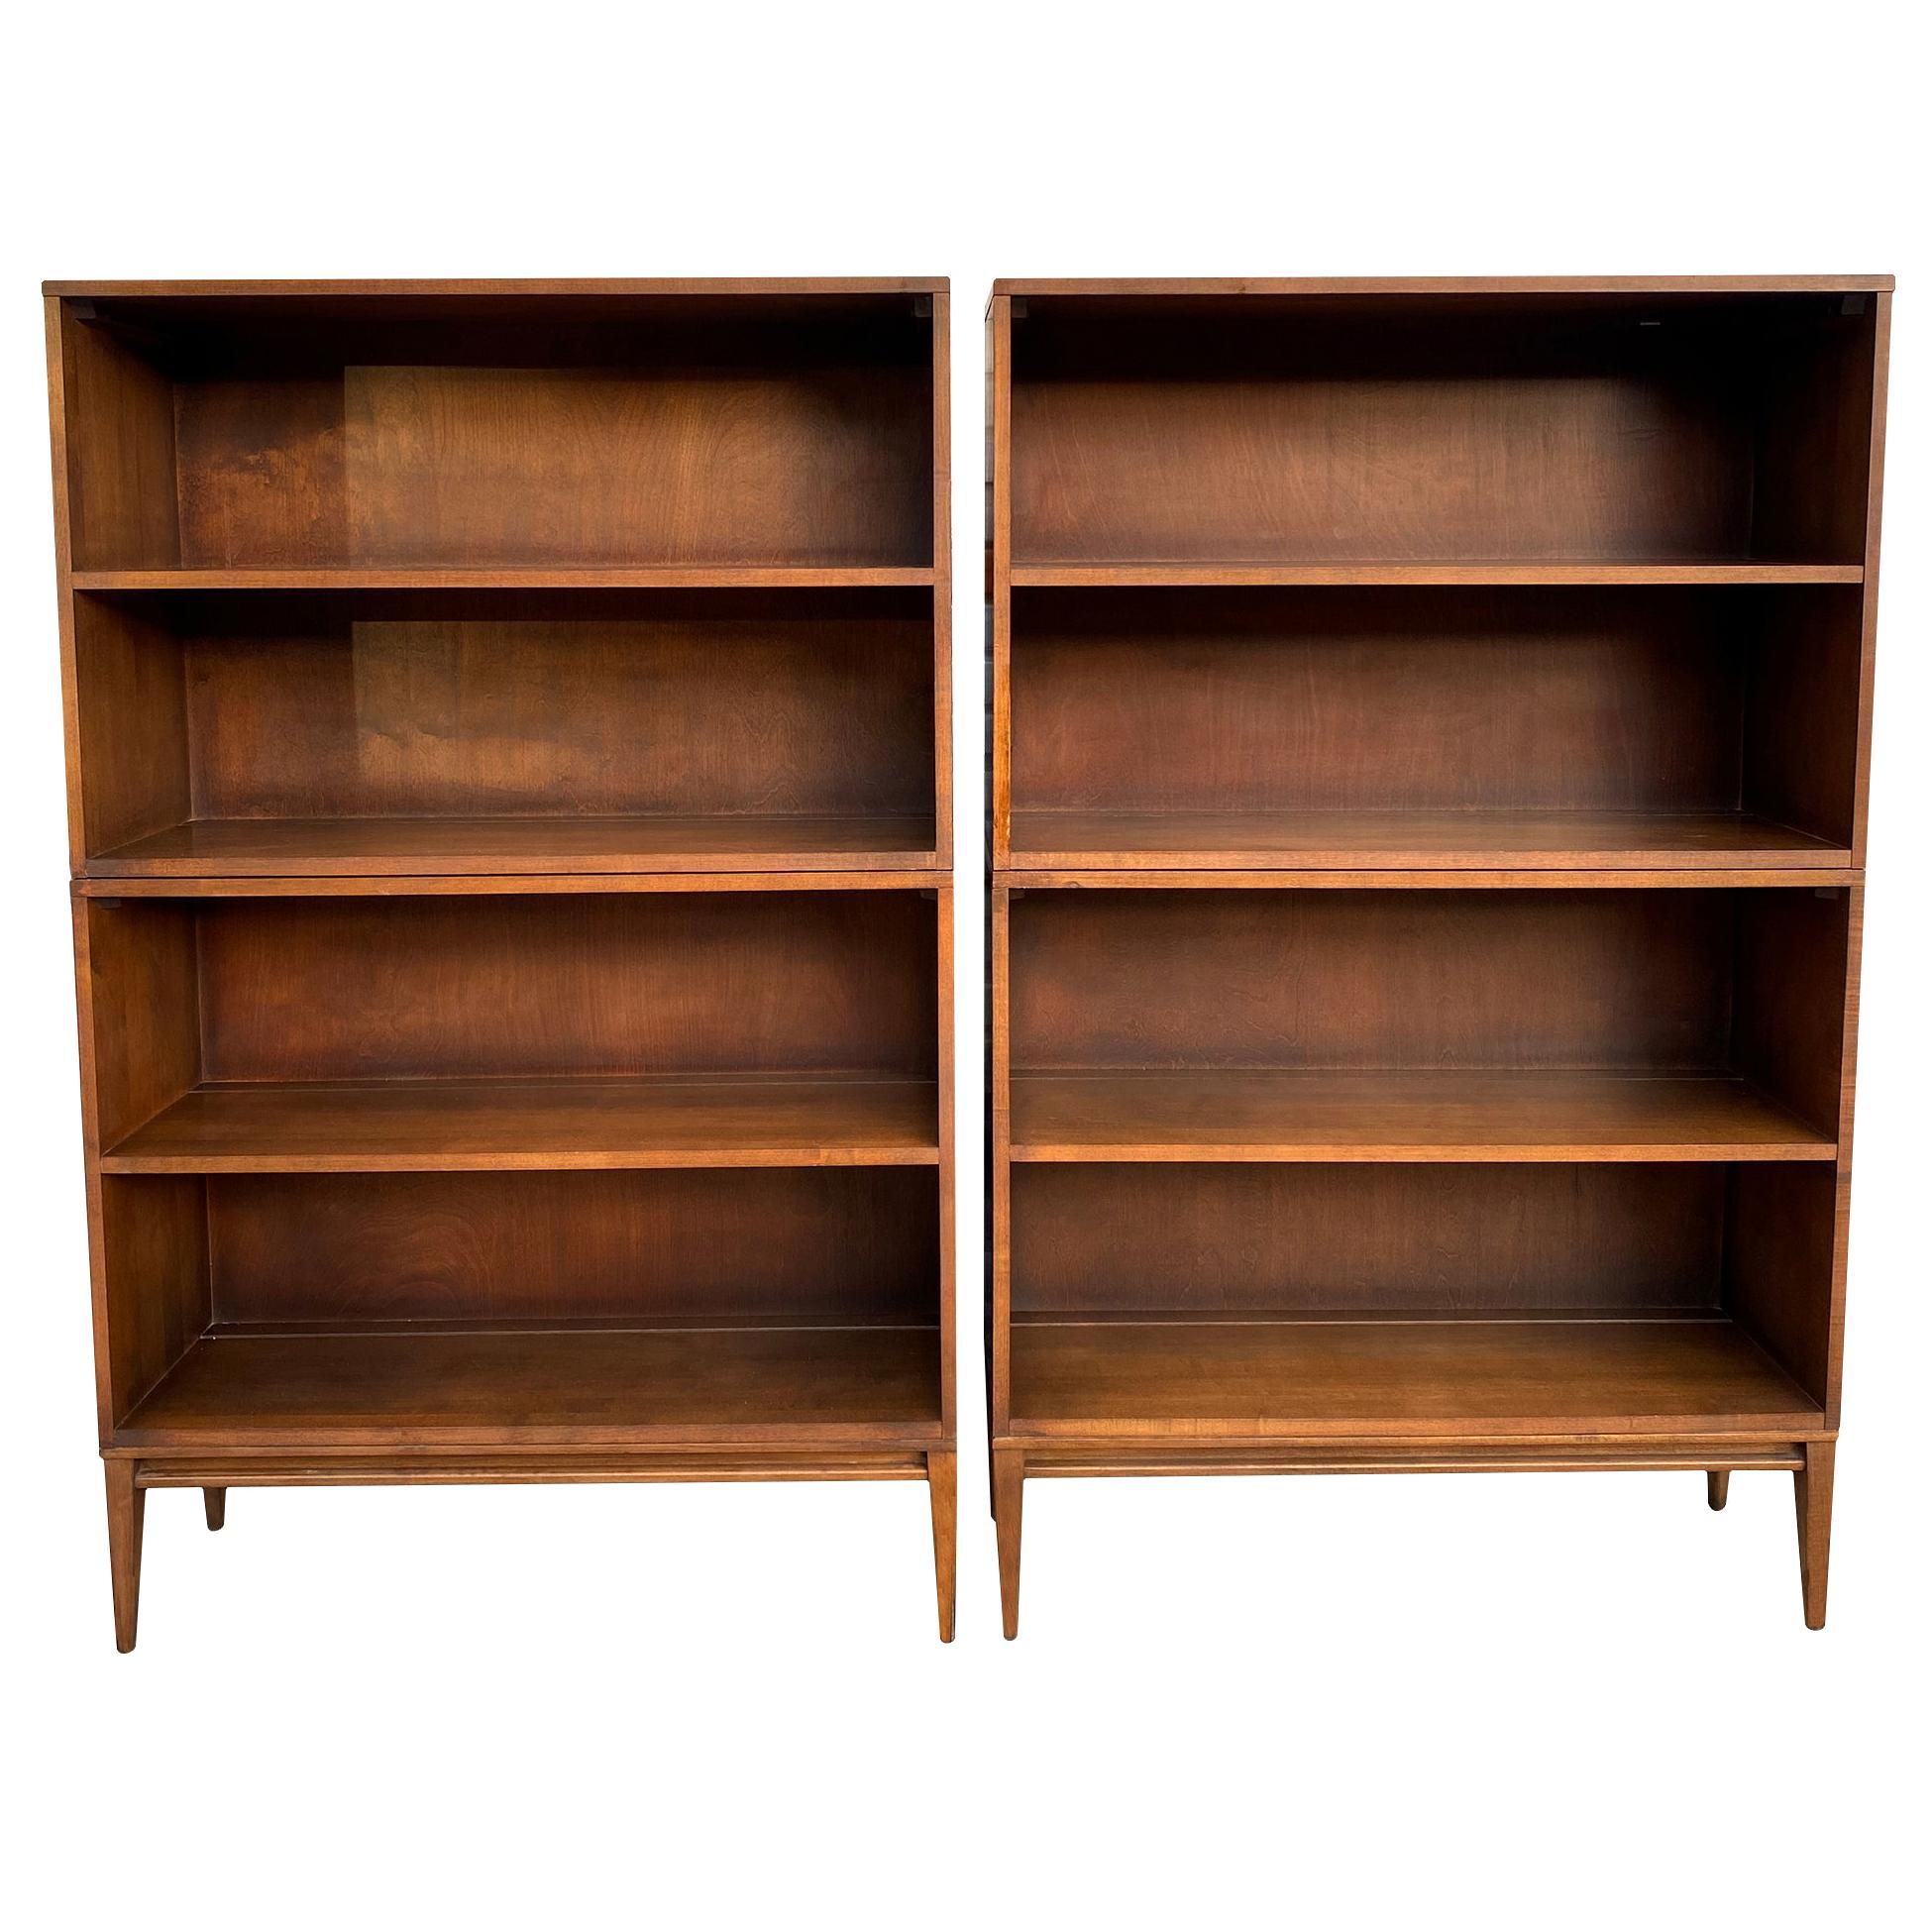 Pair of Midcentury Paul McCobb Double Bookshelves #1516 Maple Walnut Finish